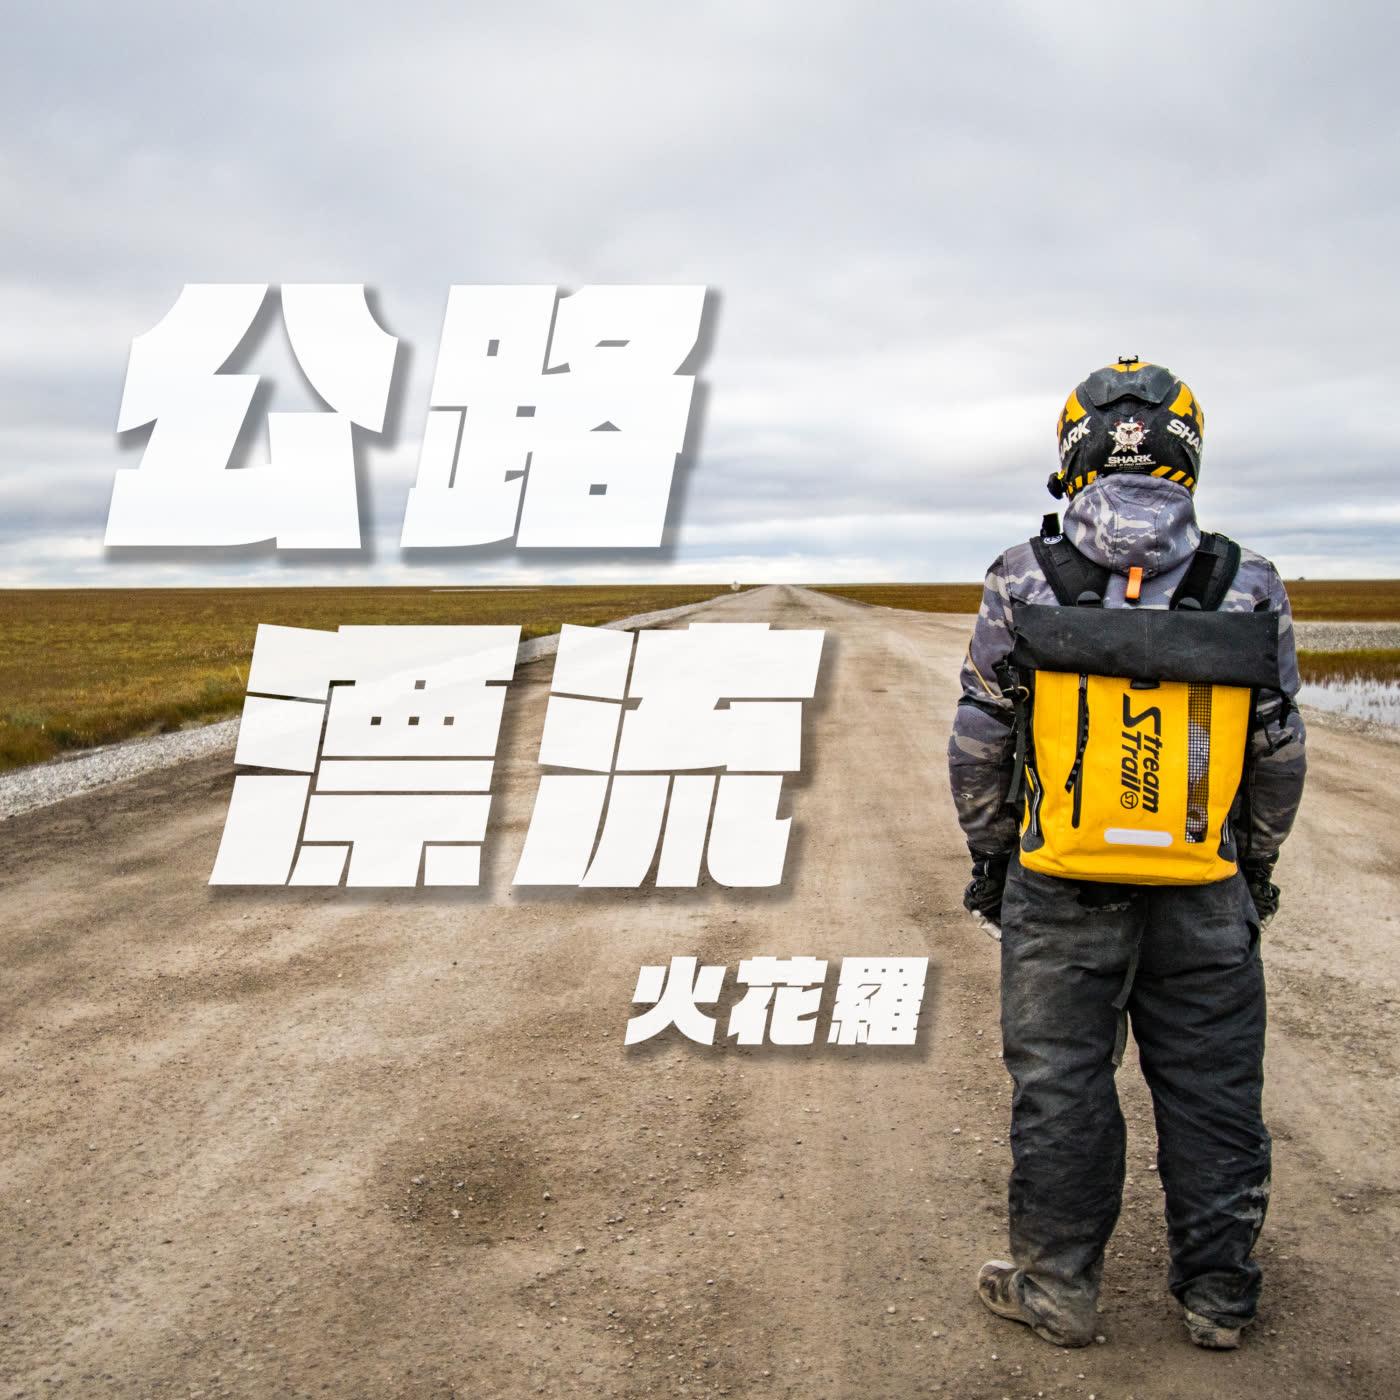 EP8 台灣交通爛到爆!沒人行道、機車亂管、速限亂定都是你各位罪該萬死啊!ft. 邱顯智